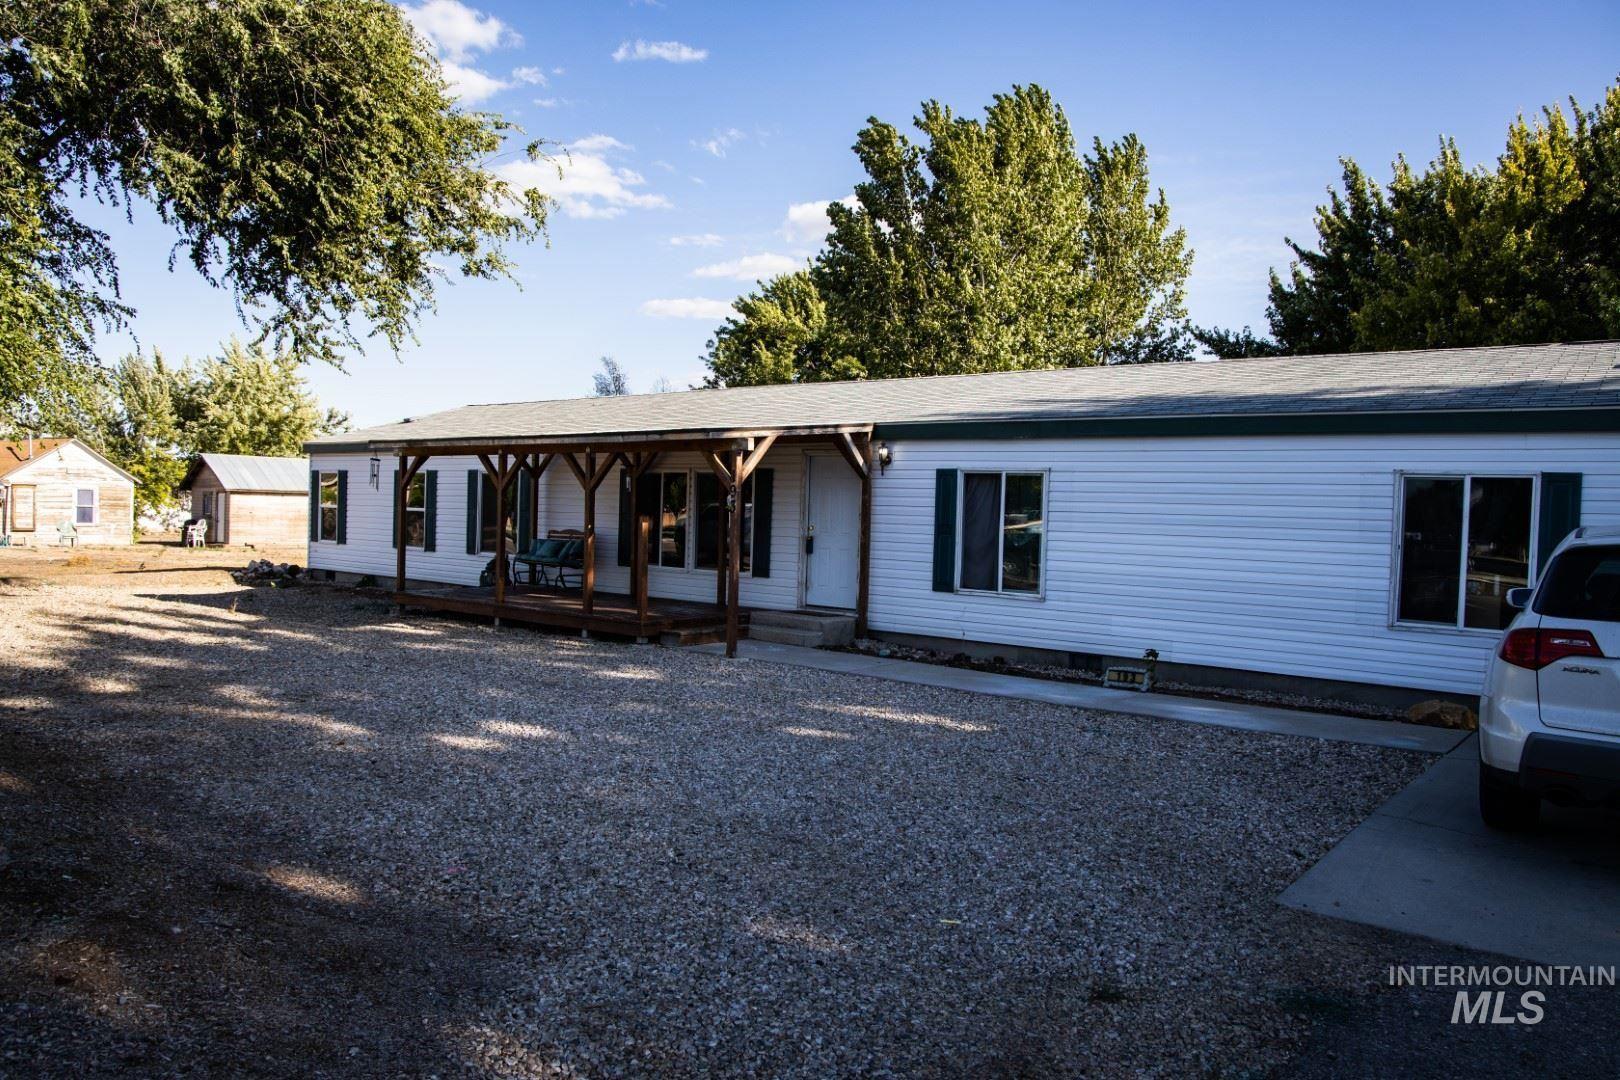 193 W Boise St, Kuna, ID 83634 - MLS#: 98779282